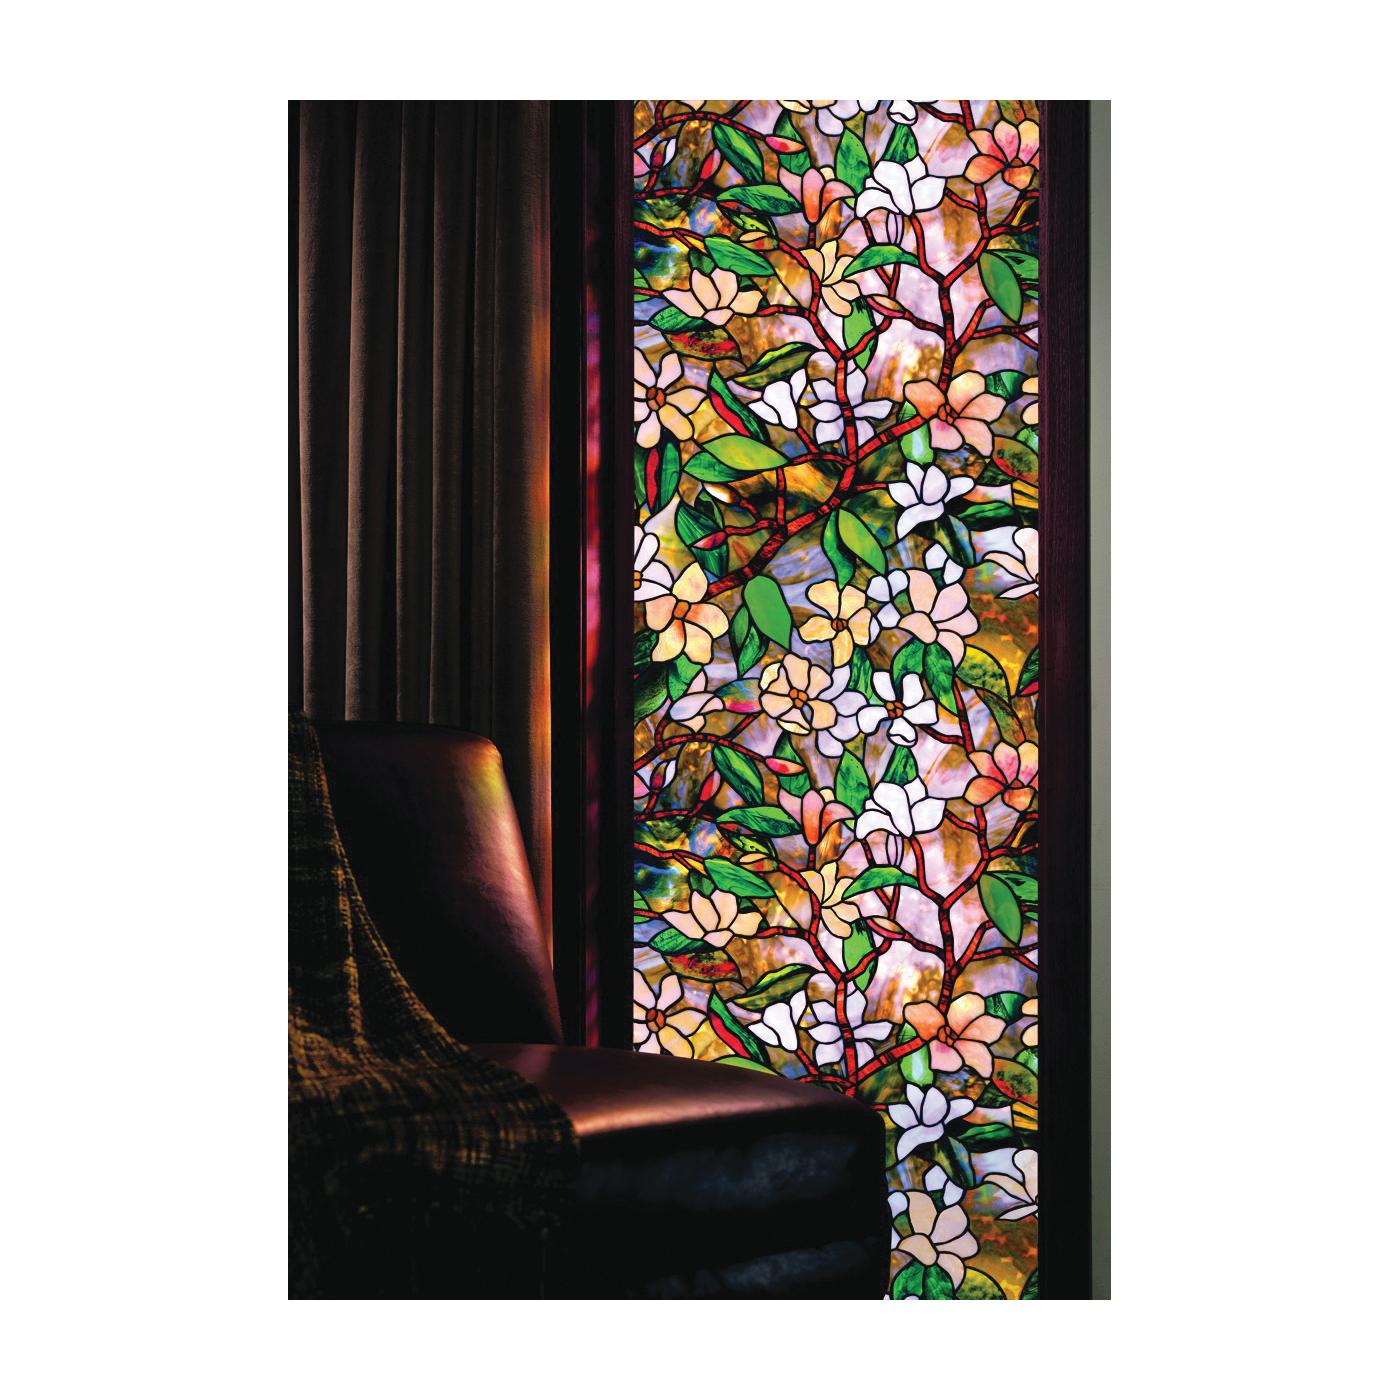 Picture of ARTSCAPE 01-0113 Window Film, 36 in L, 24 in W, Magnolia Pattern